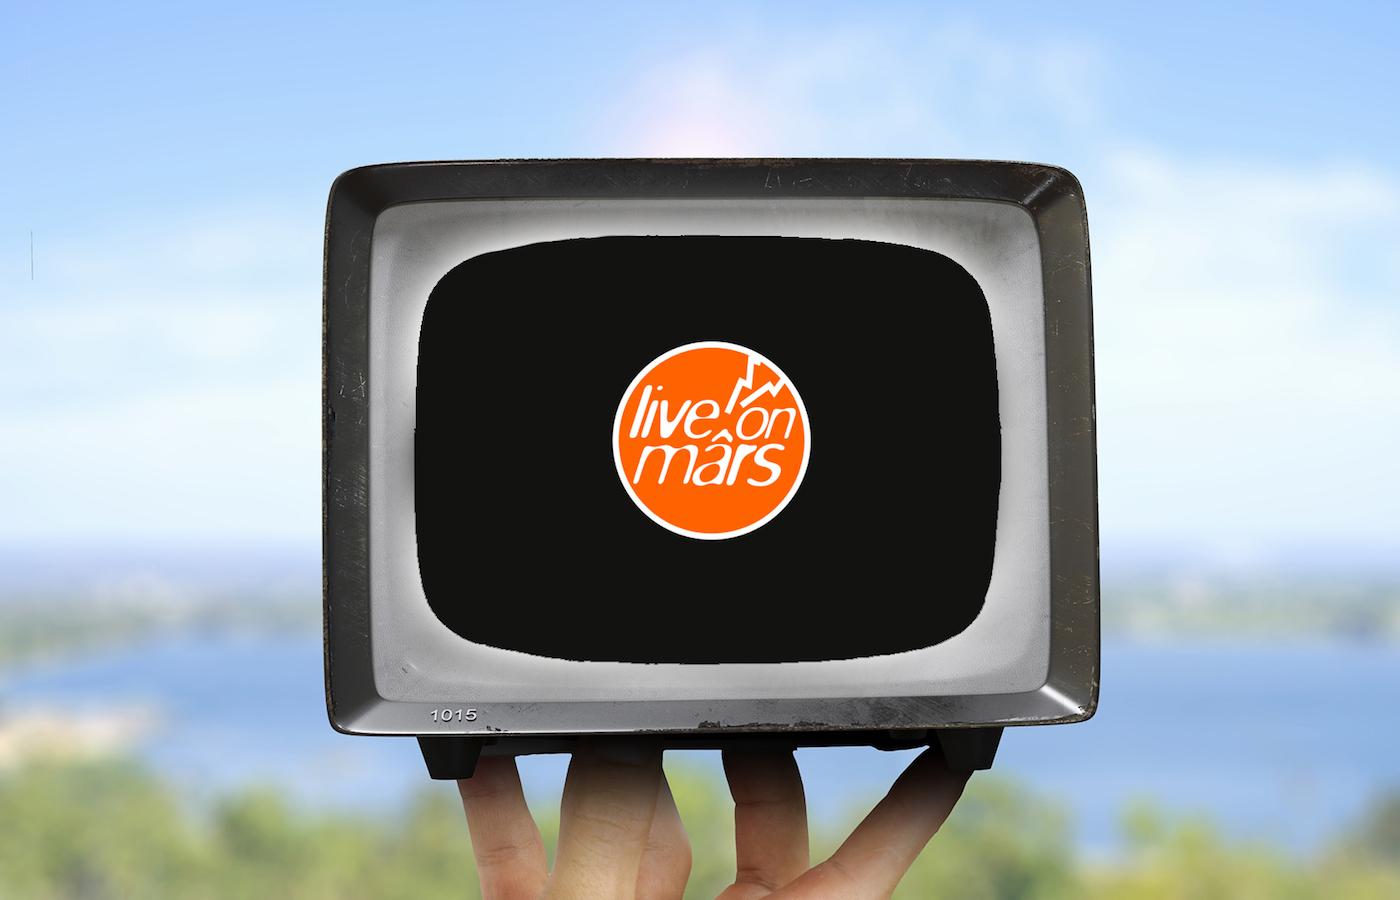 LiveOnMârs Tv